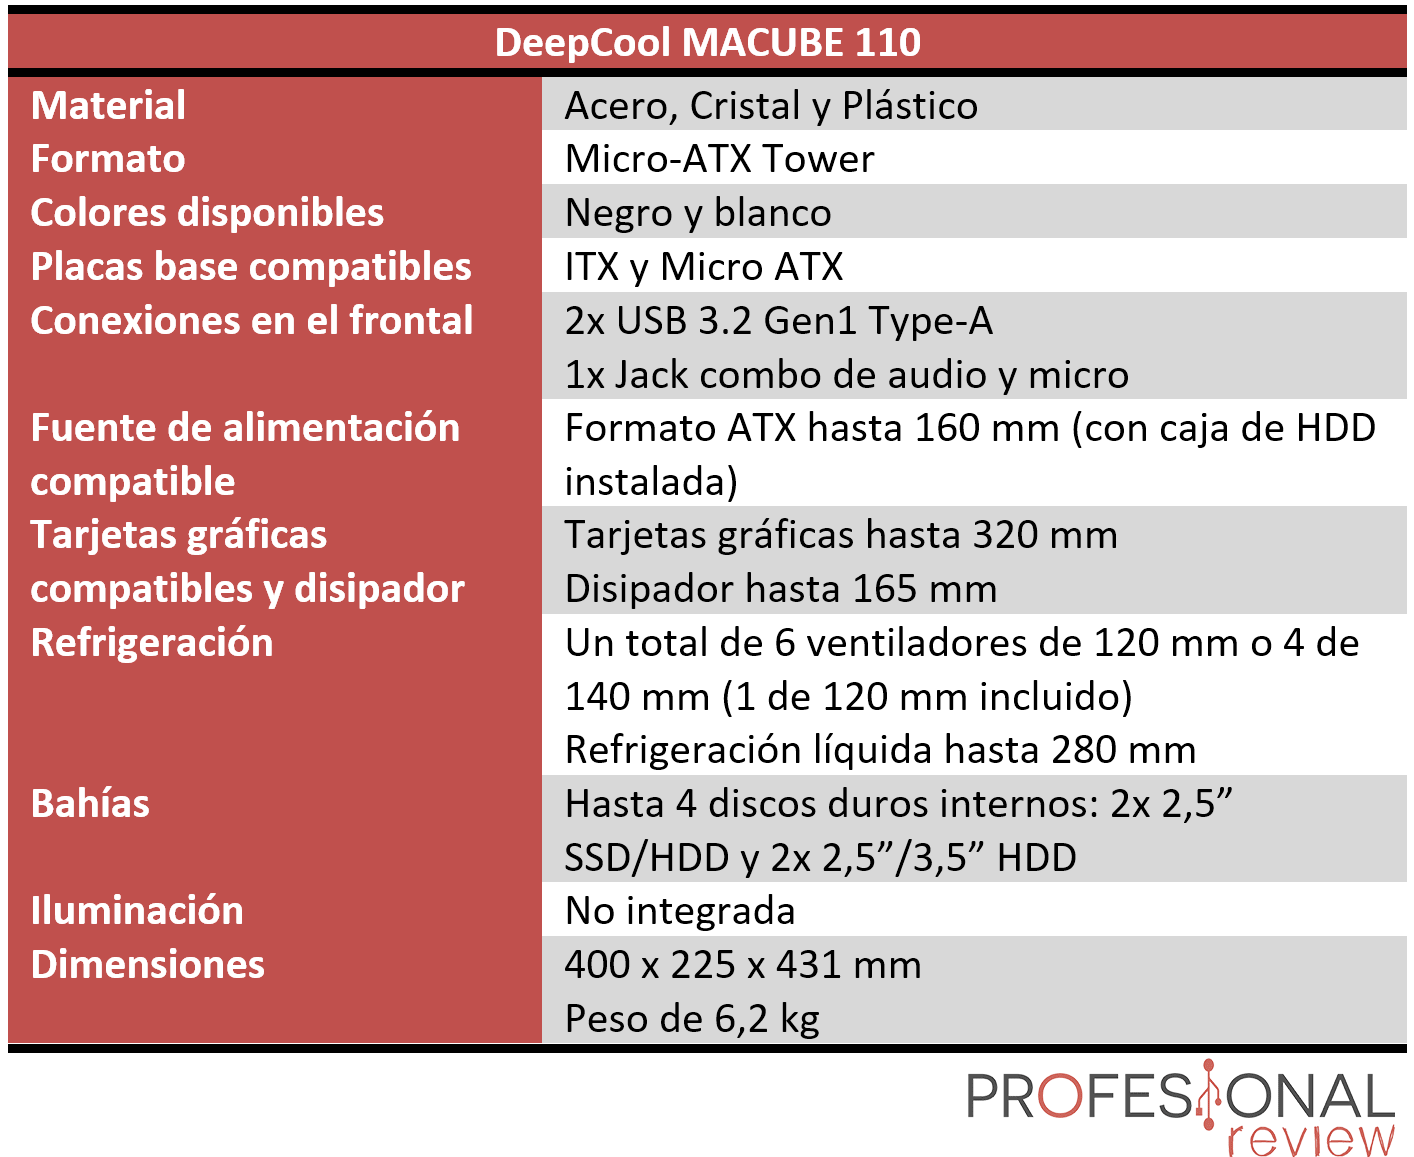 DeepCool MACUBE 110 Características